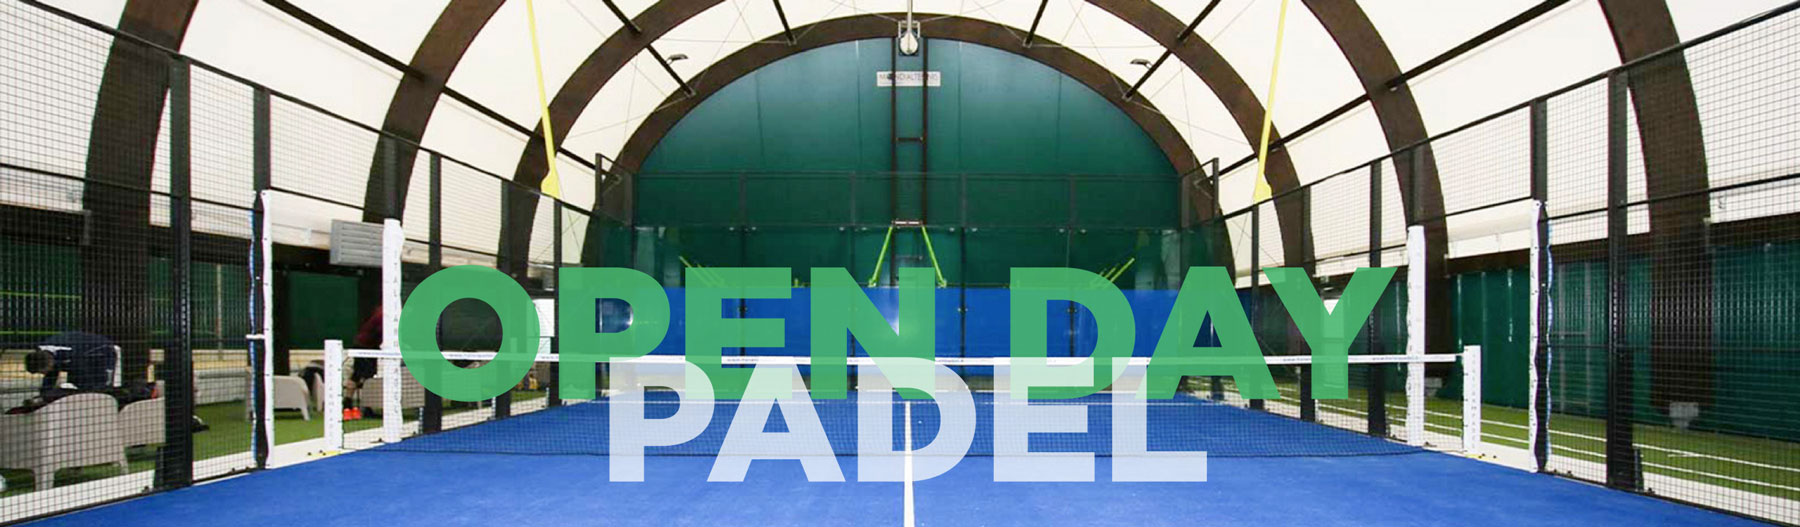 Open Day Padel -Take Care Sport Center